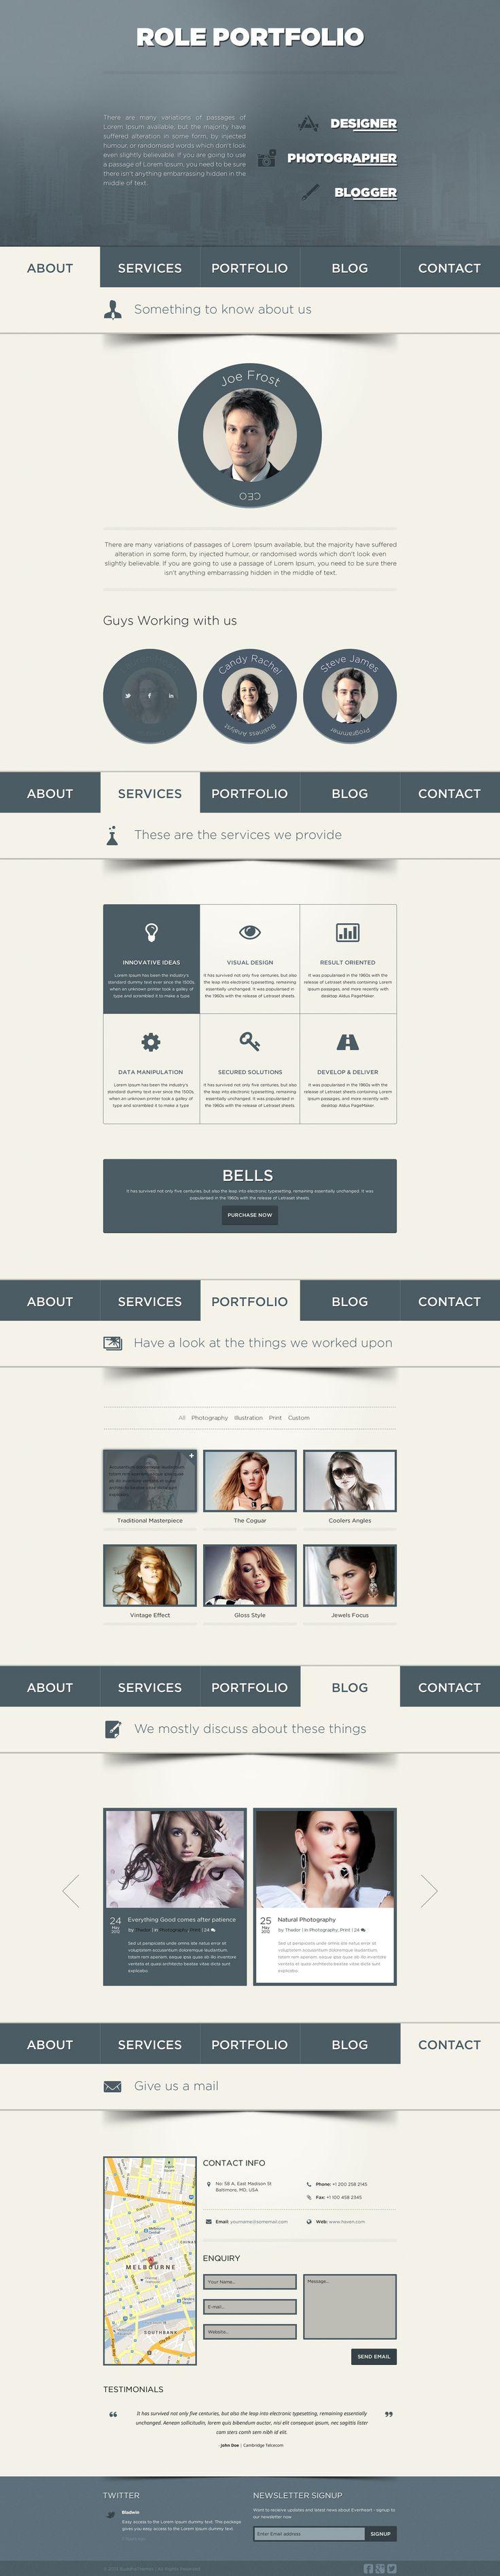 108 best Wordpress Theme images on Pinterest | Website designs ...